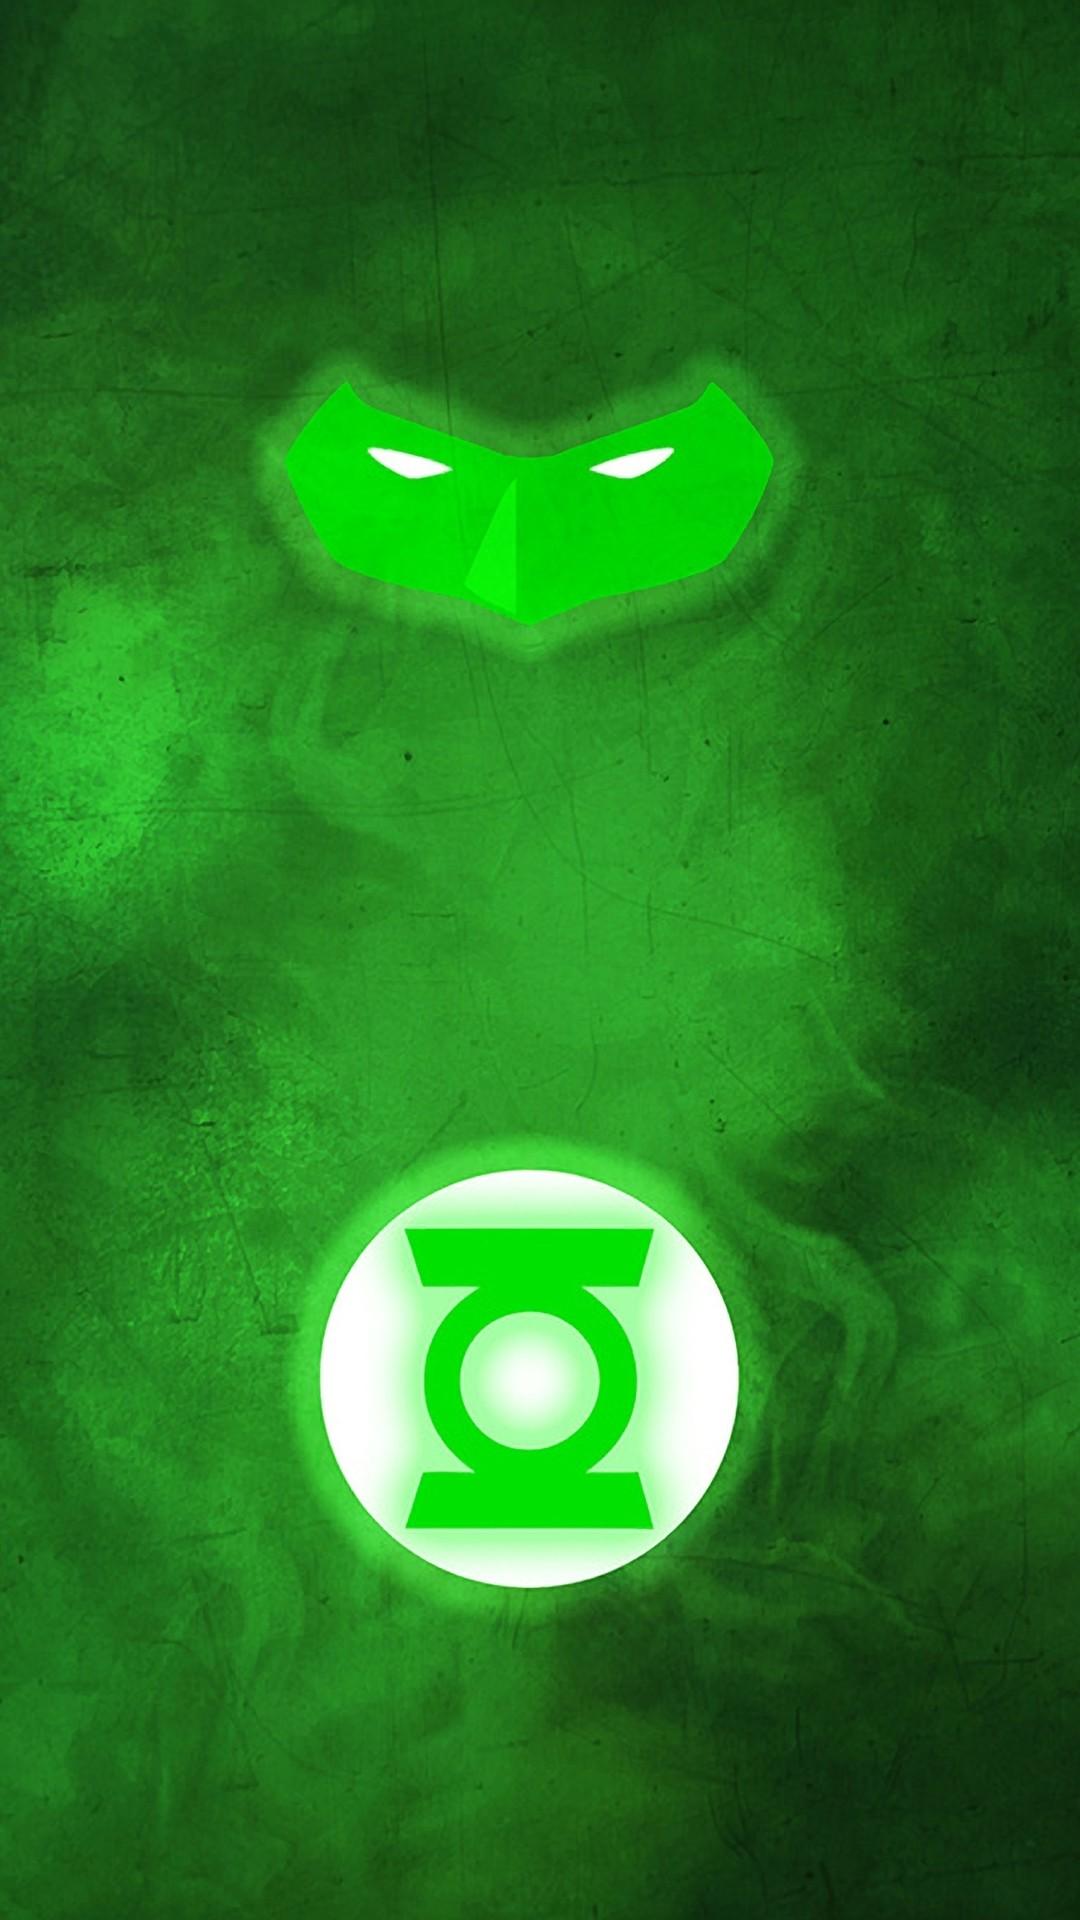 Green Lantern Hd Wallpaper Posted By Ryan Simpson